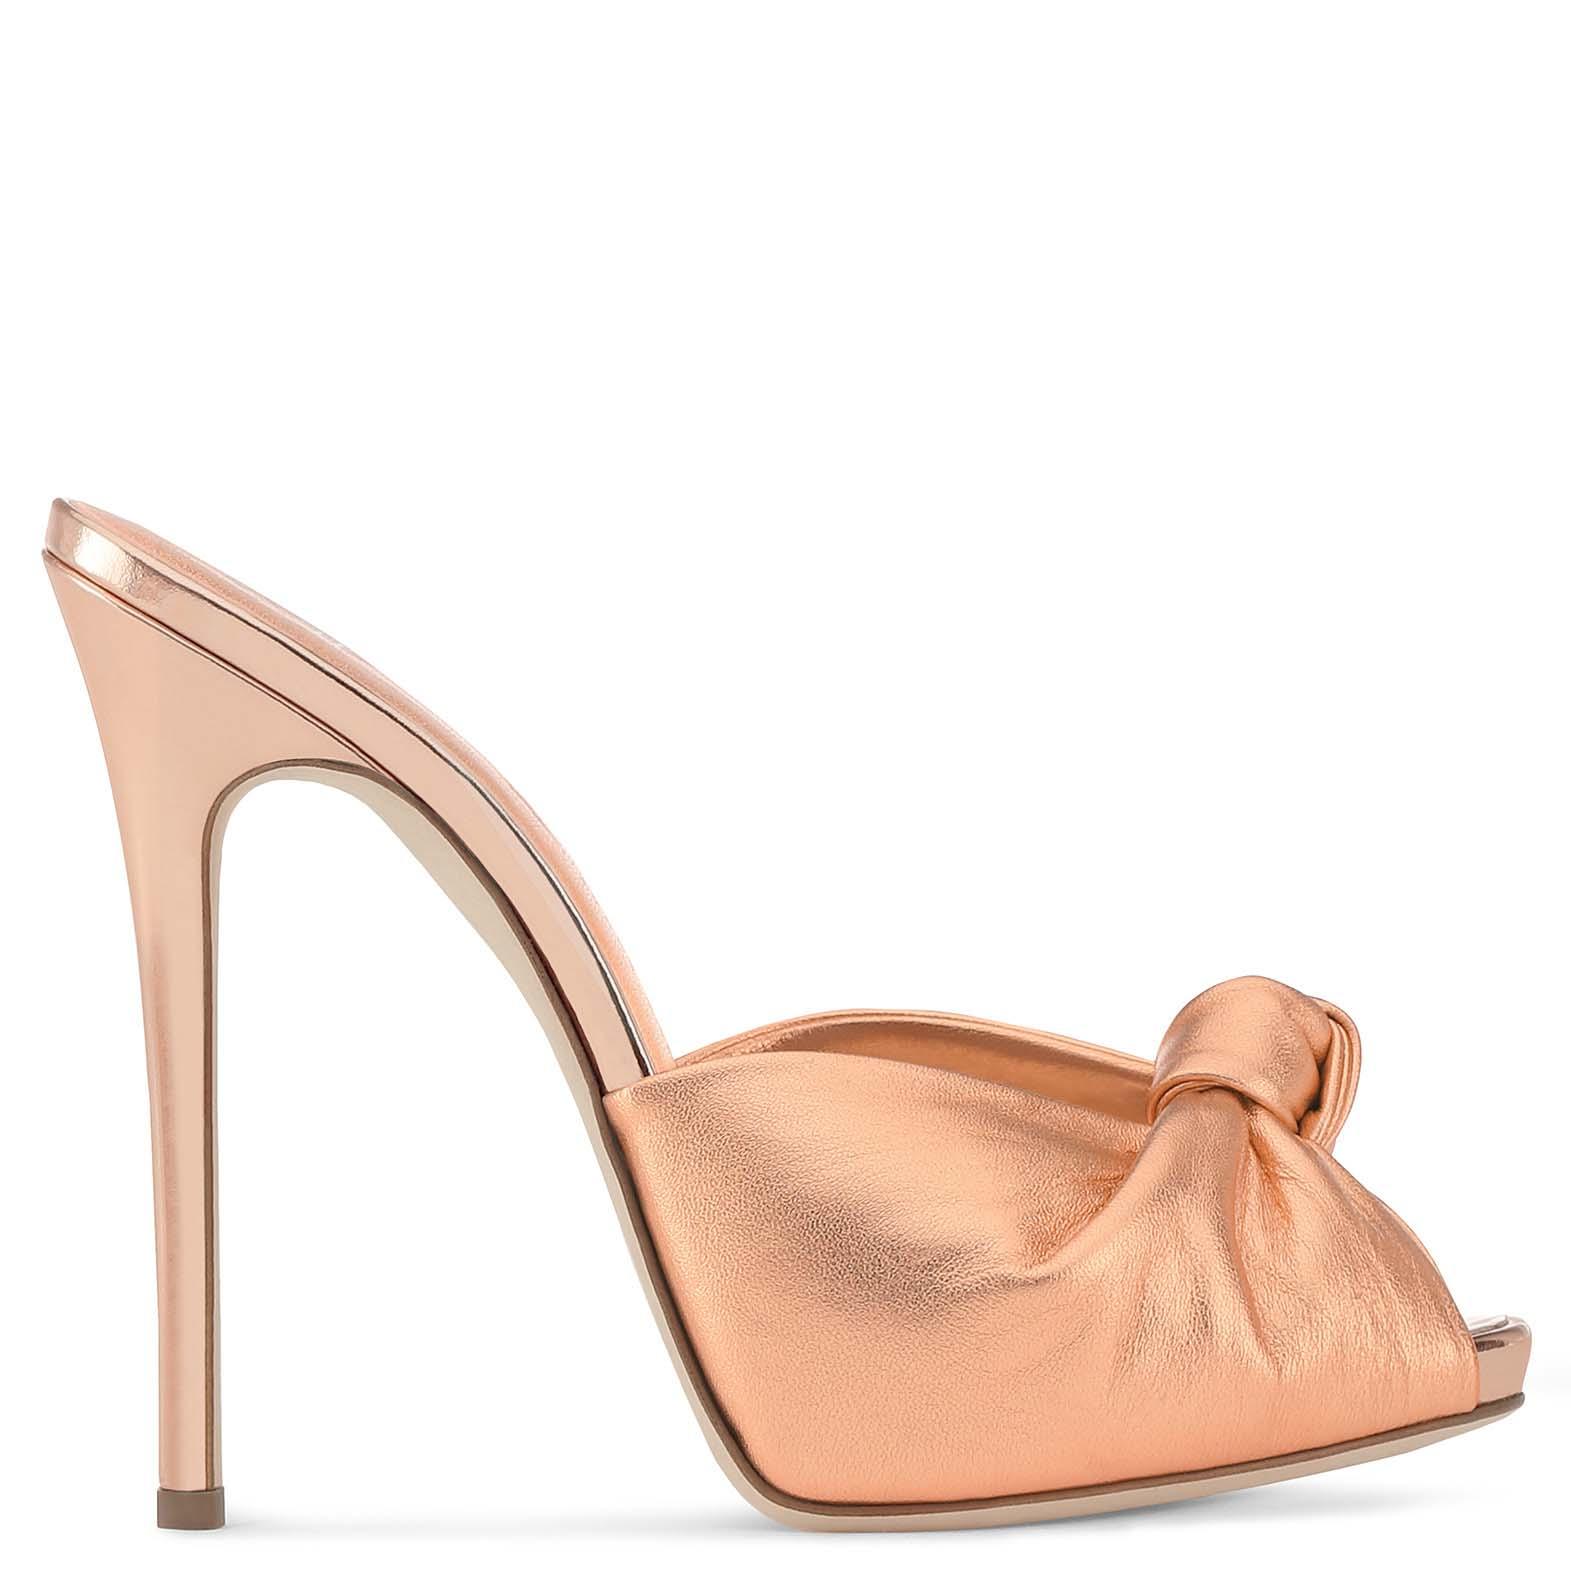 latest-party-wedding-wear-shoes-by-giuseppe-zanotti-2017-14